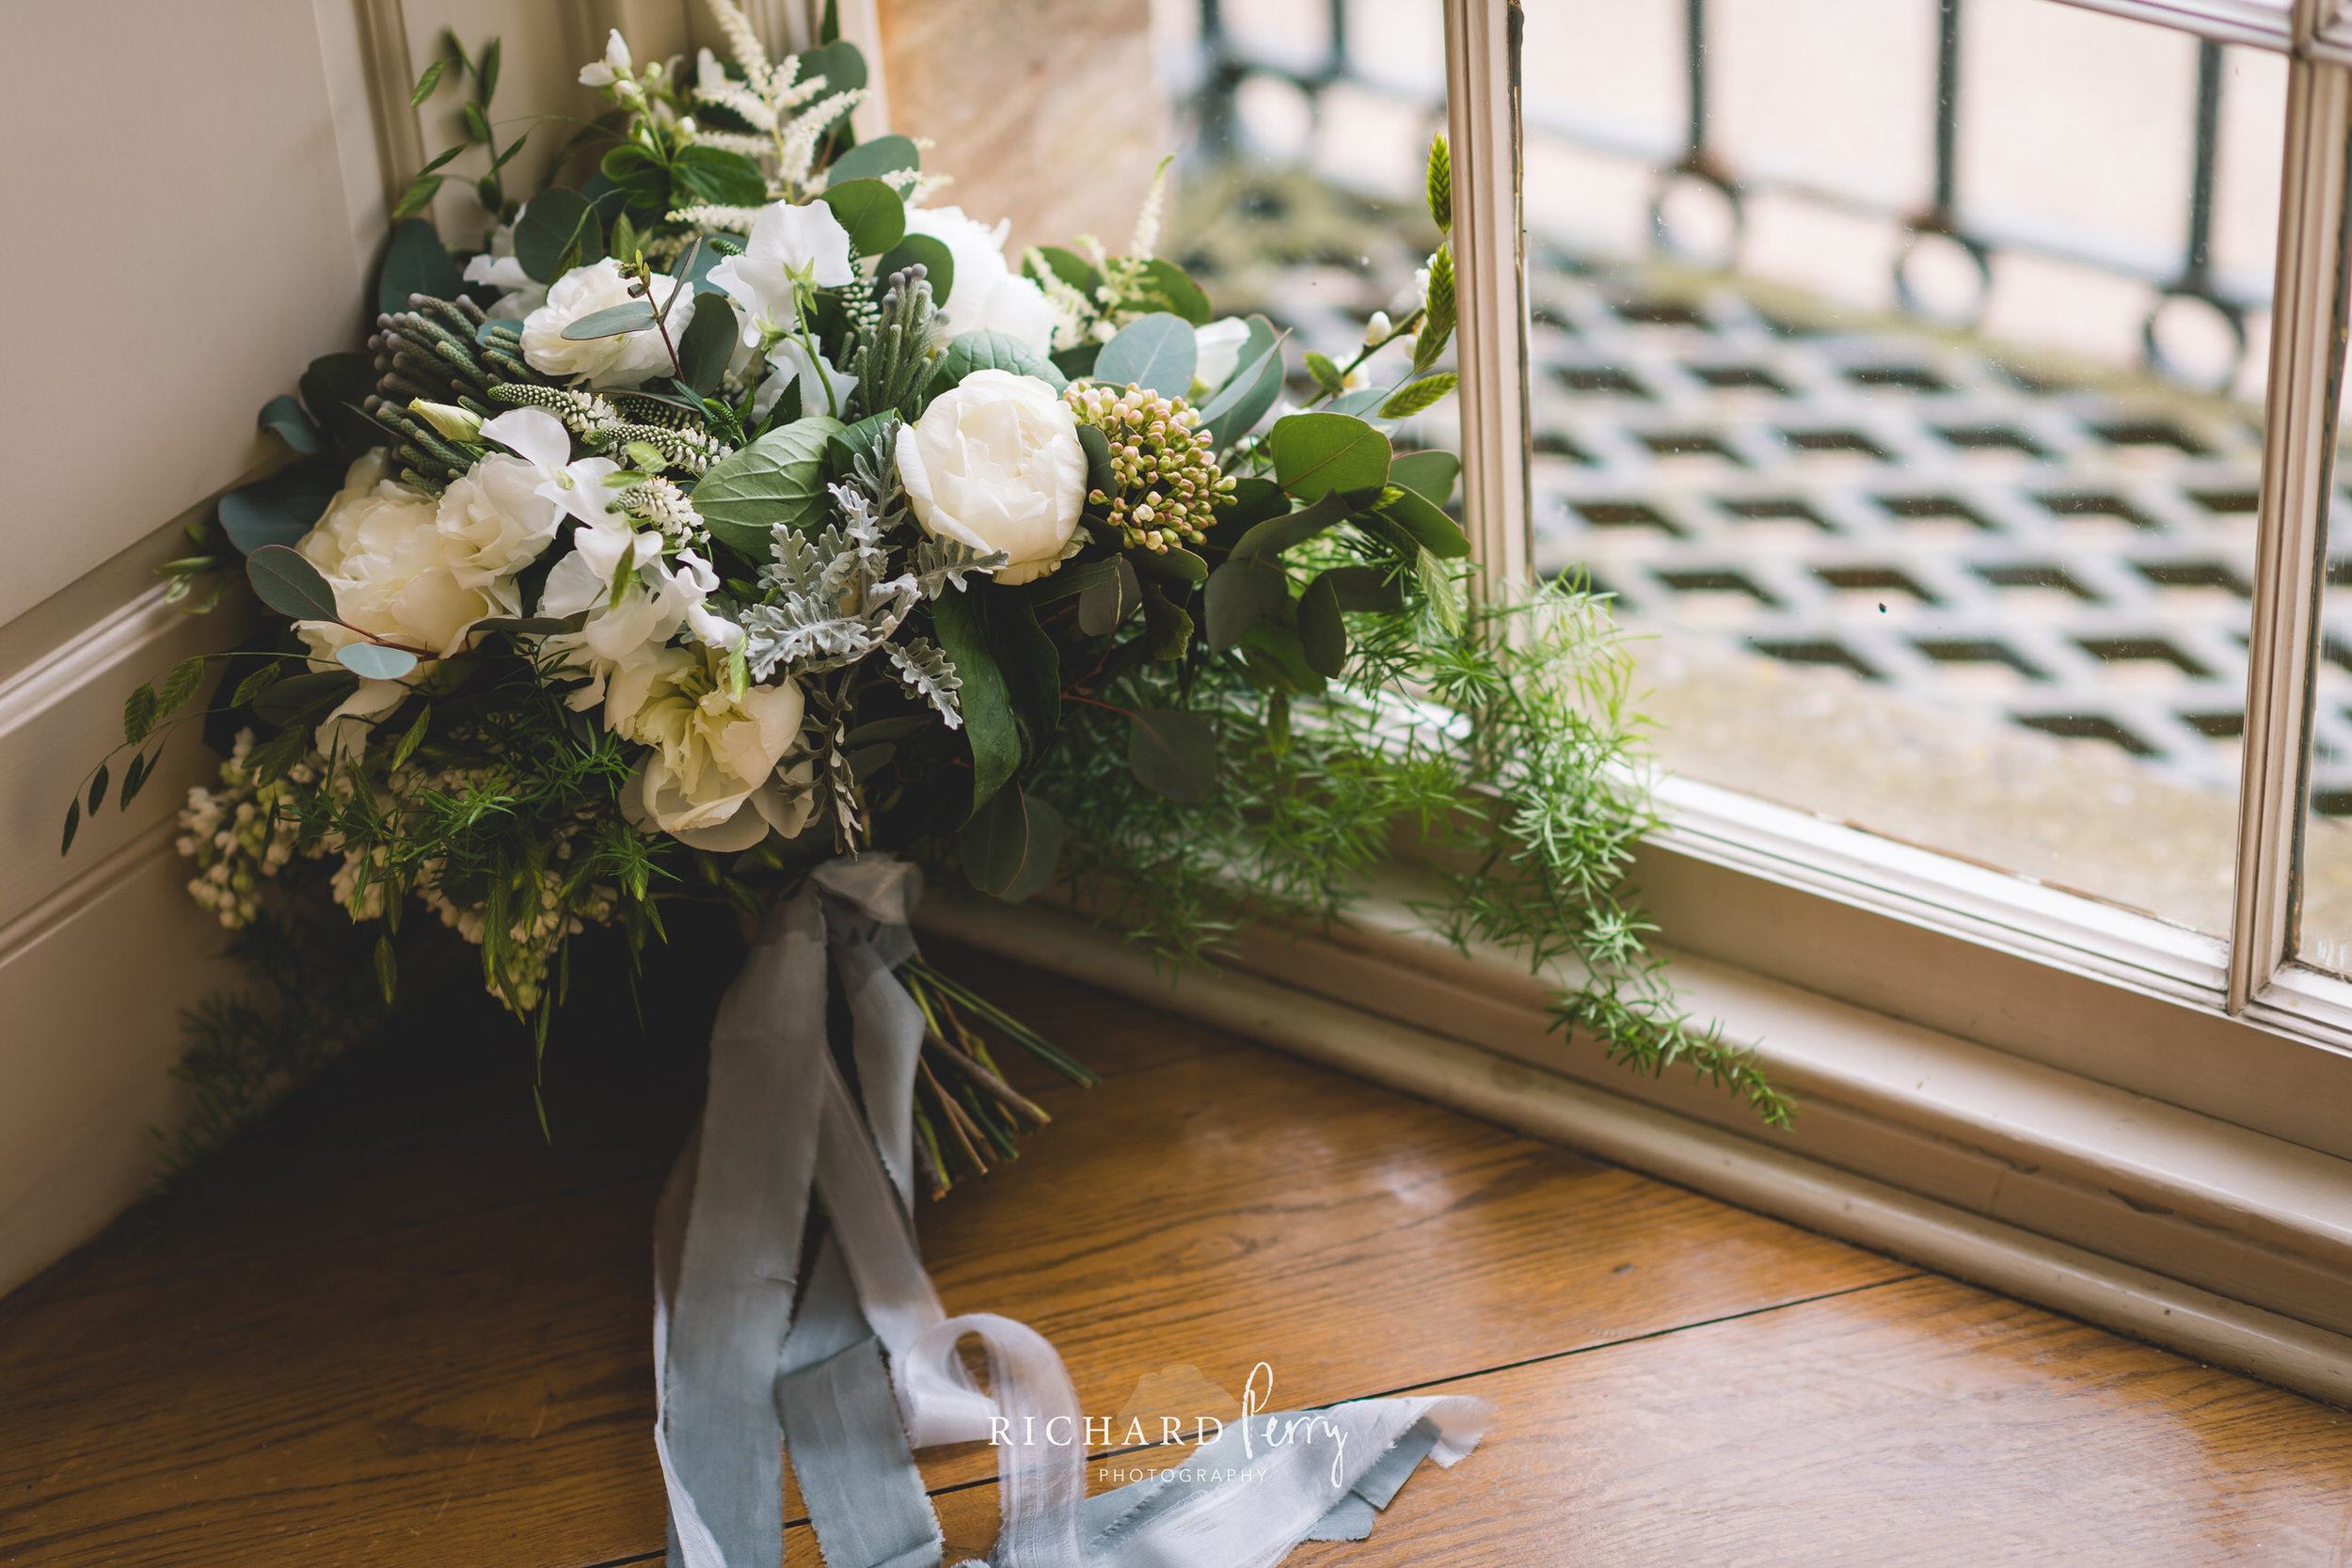 yorkshire-wedding-photographer-destination-archerfield-house-10.jpg